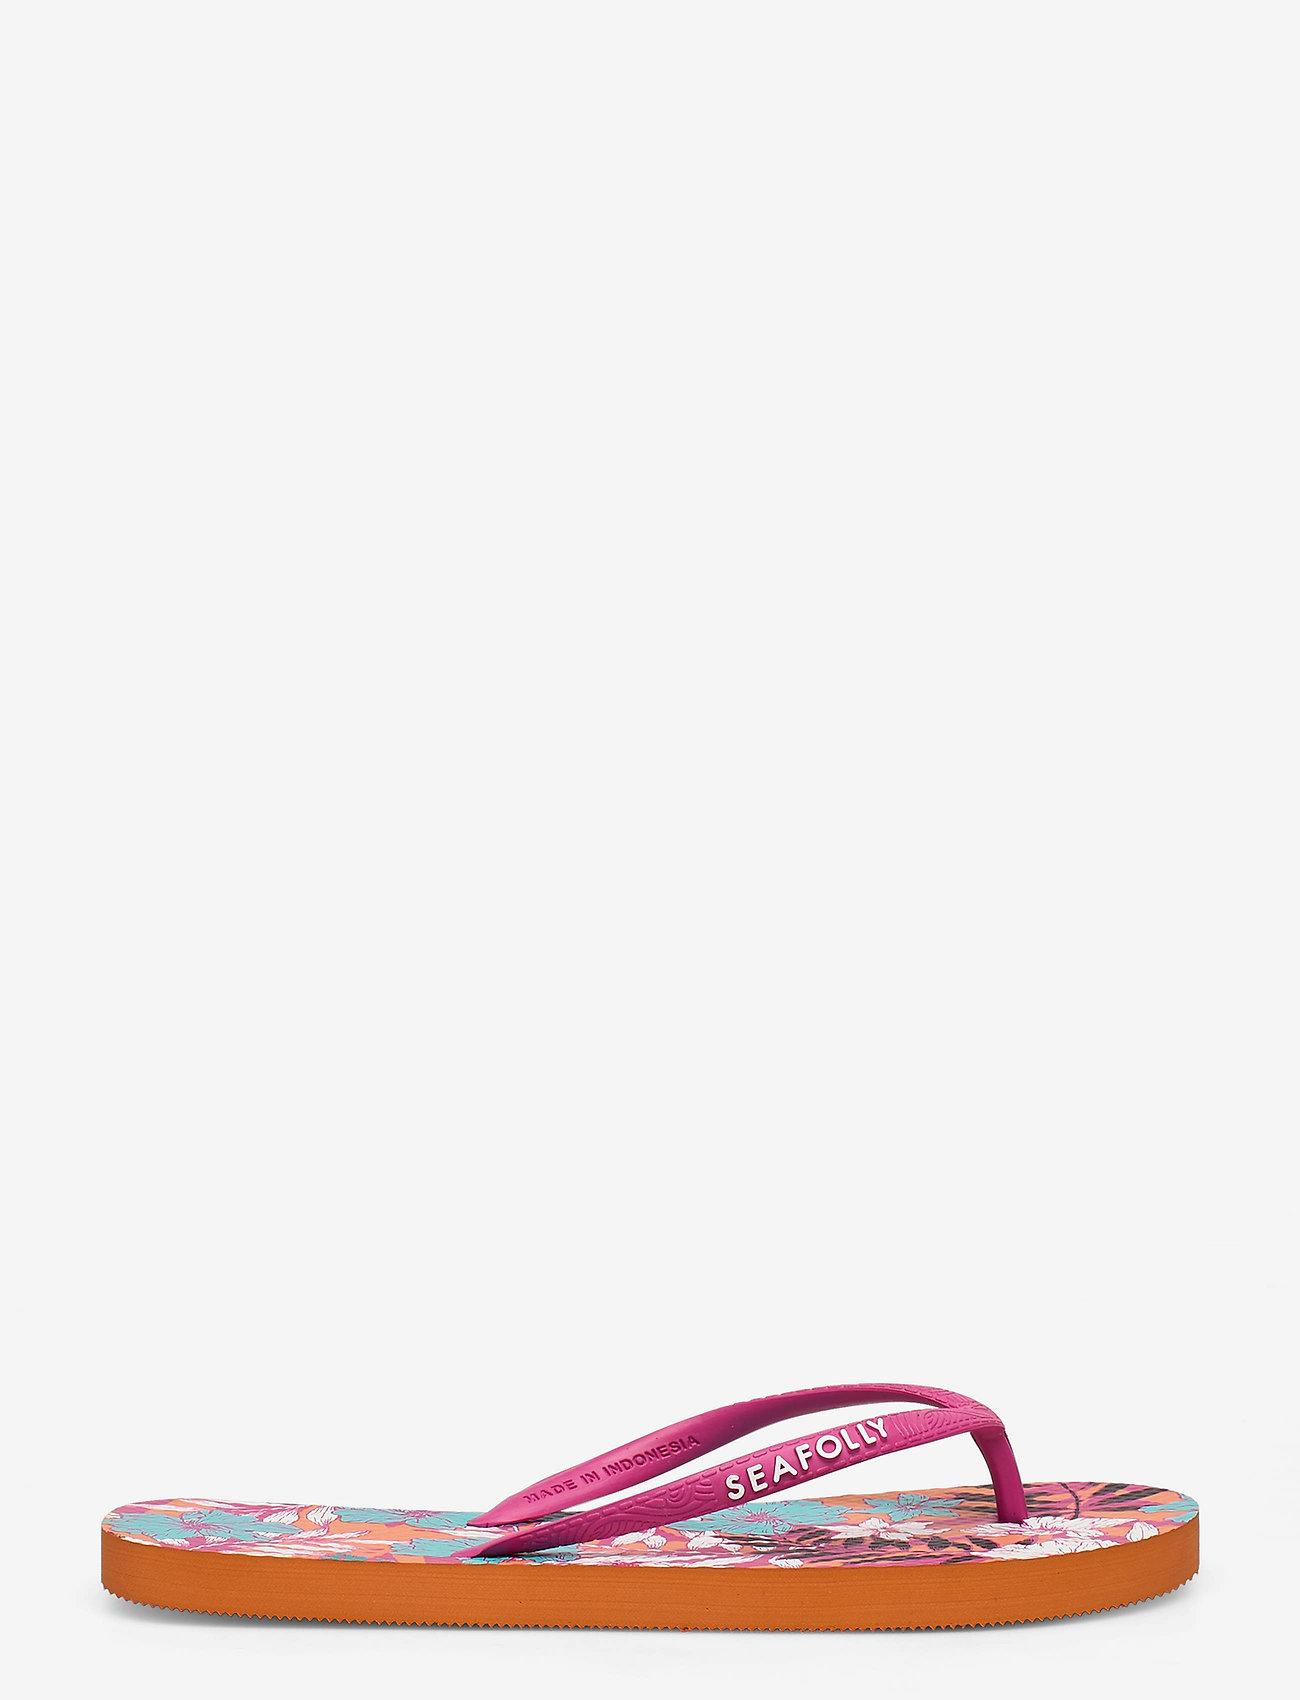 Seafolly - Copacabana Thong - strandtøj - ultra pink - 1